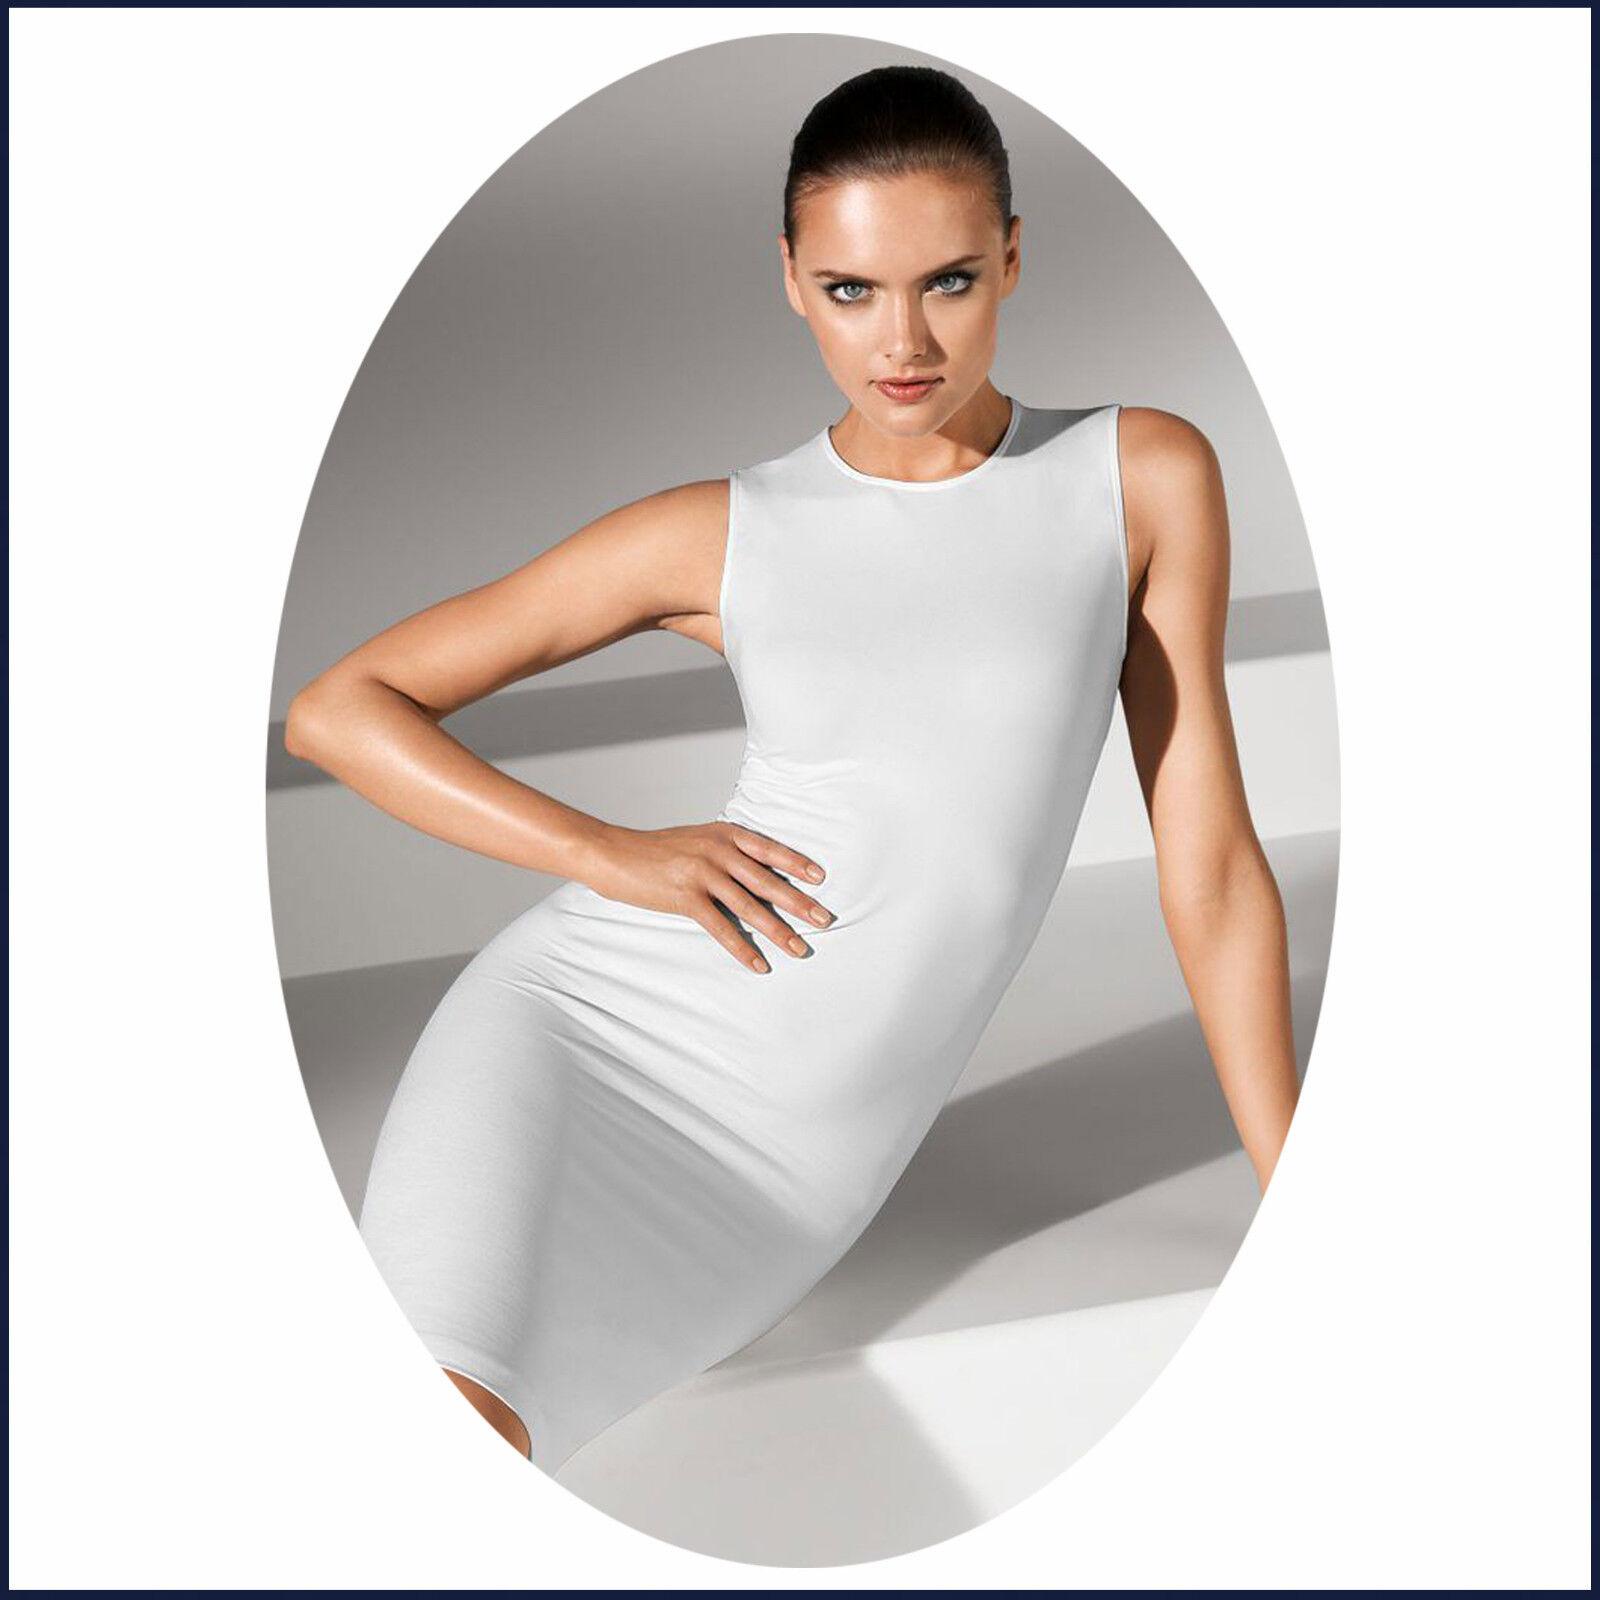 Wolford Bilbao Dress - M - Weiß ... Kleid, der perfekte Schnitt zu jedem Anlass